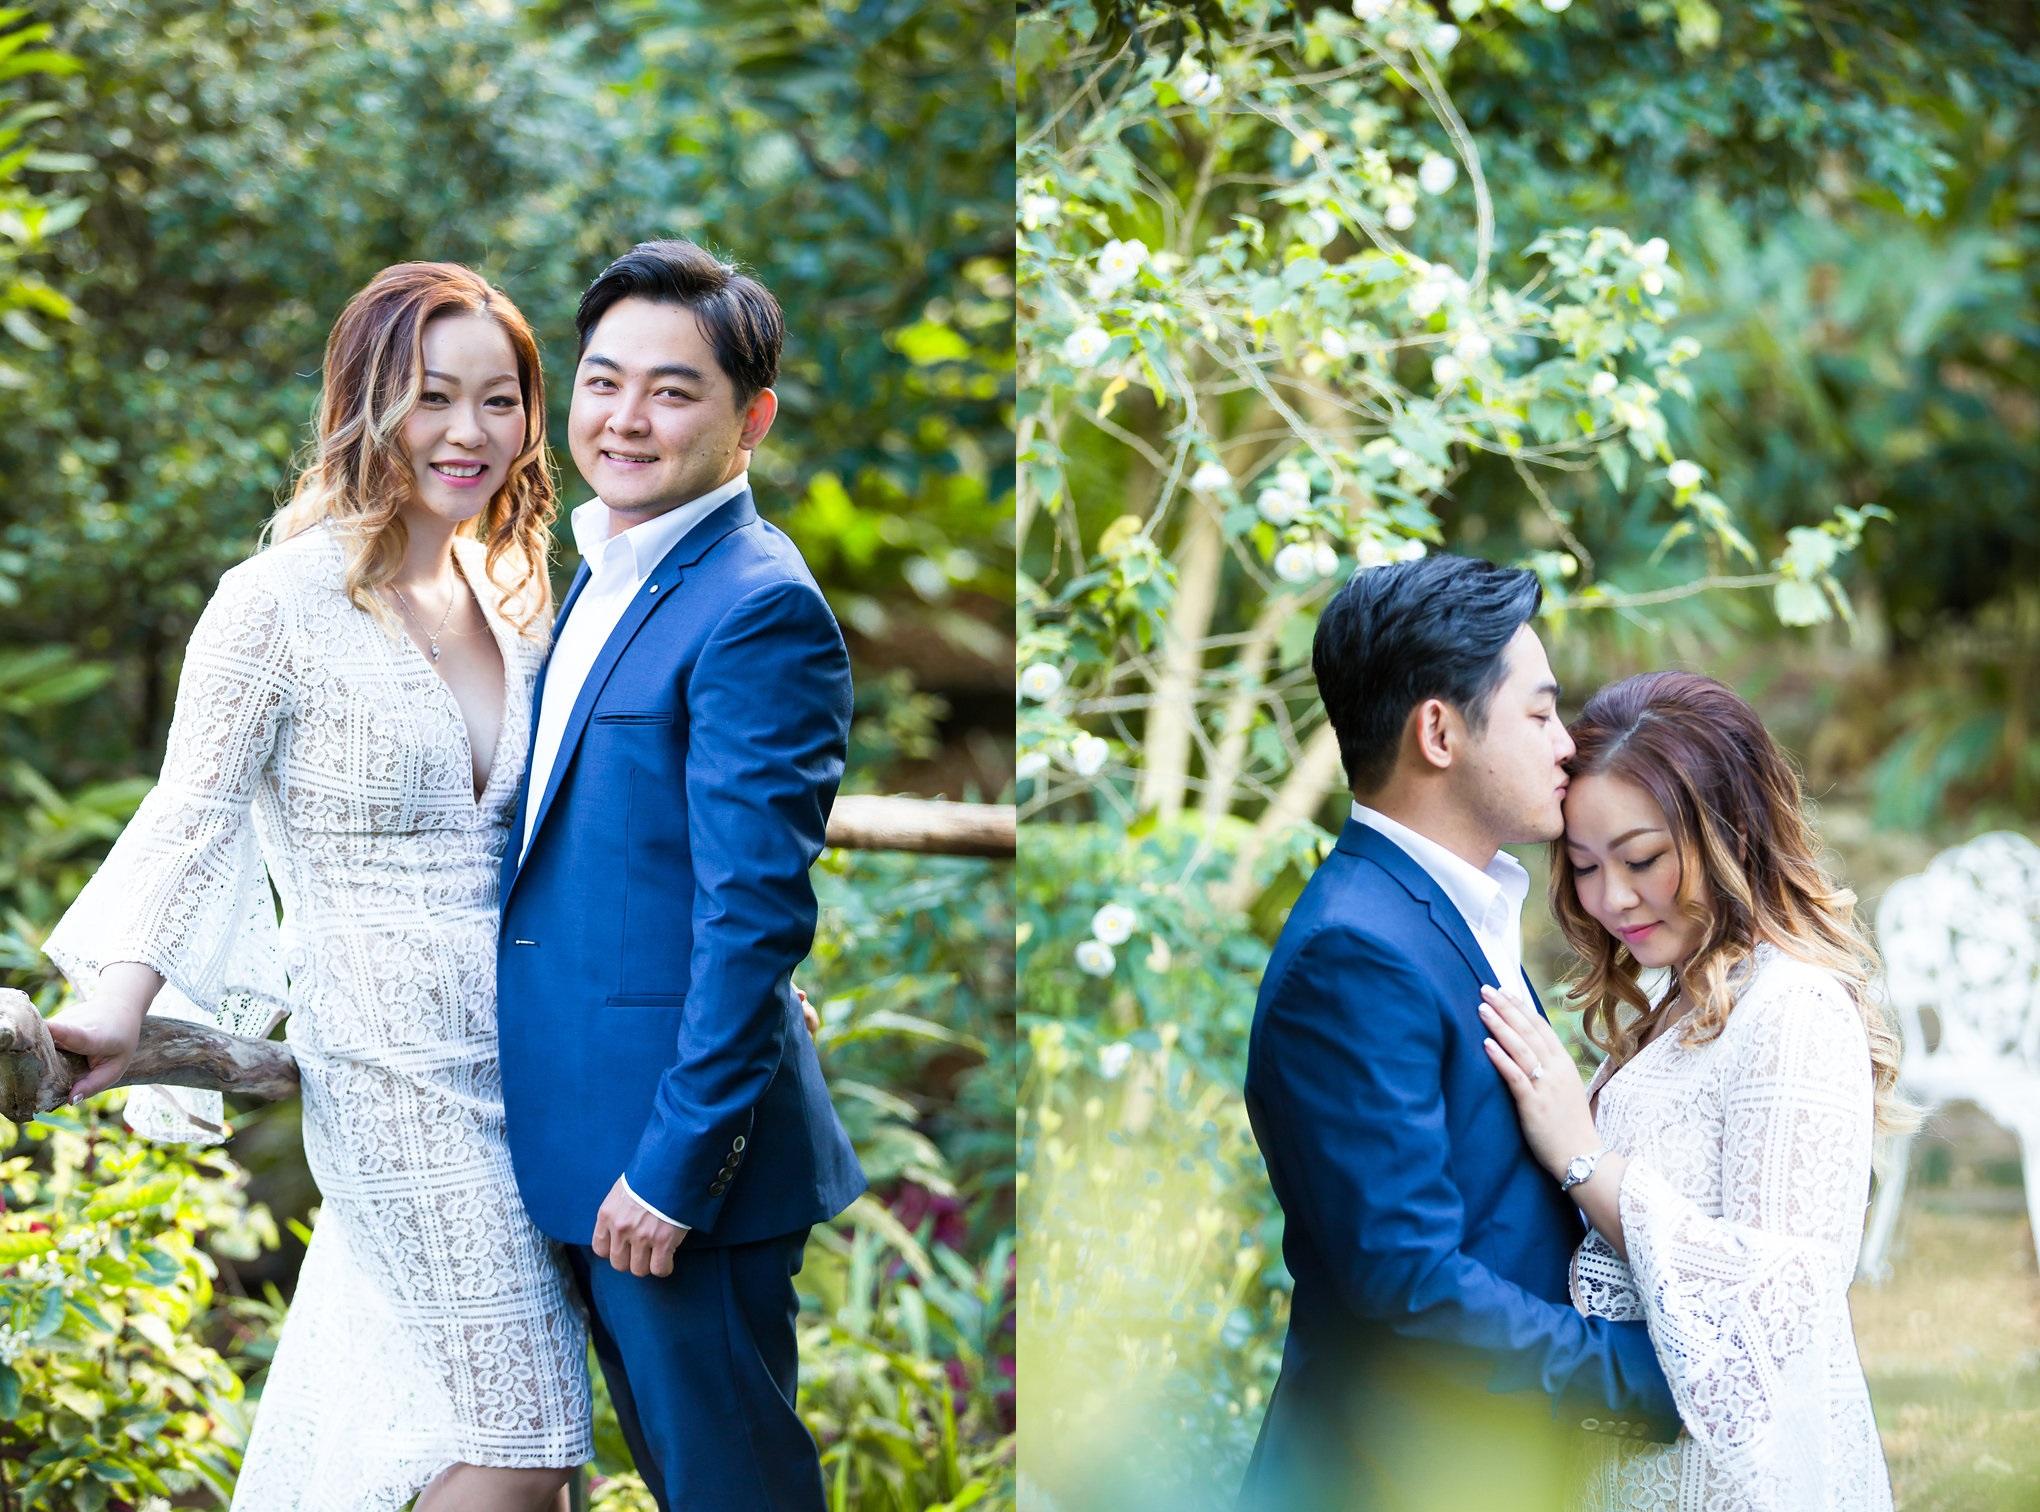 Sydney Wedding Photographer - Lavender Bay - Jennifer Lam Photography (7).jpg